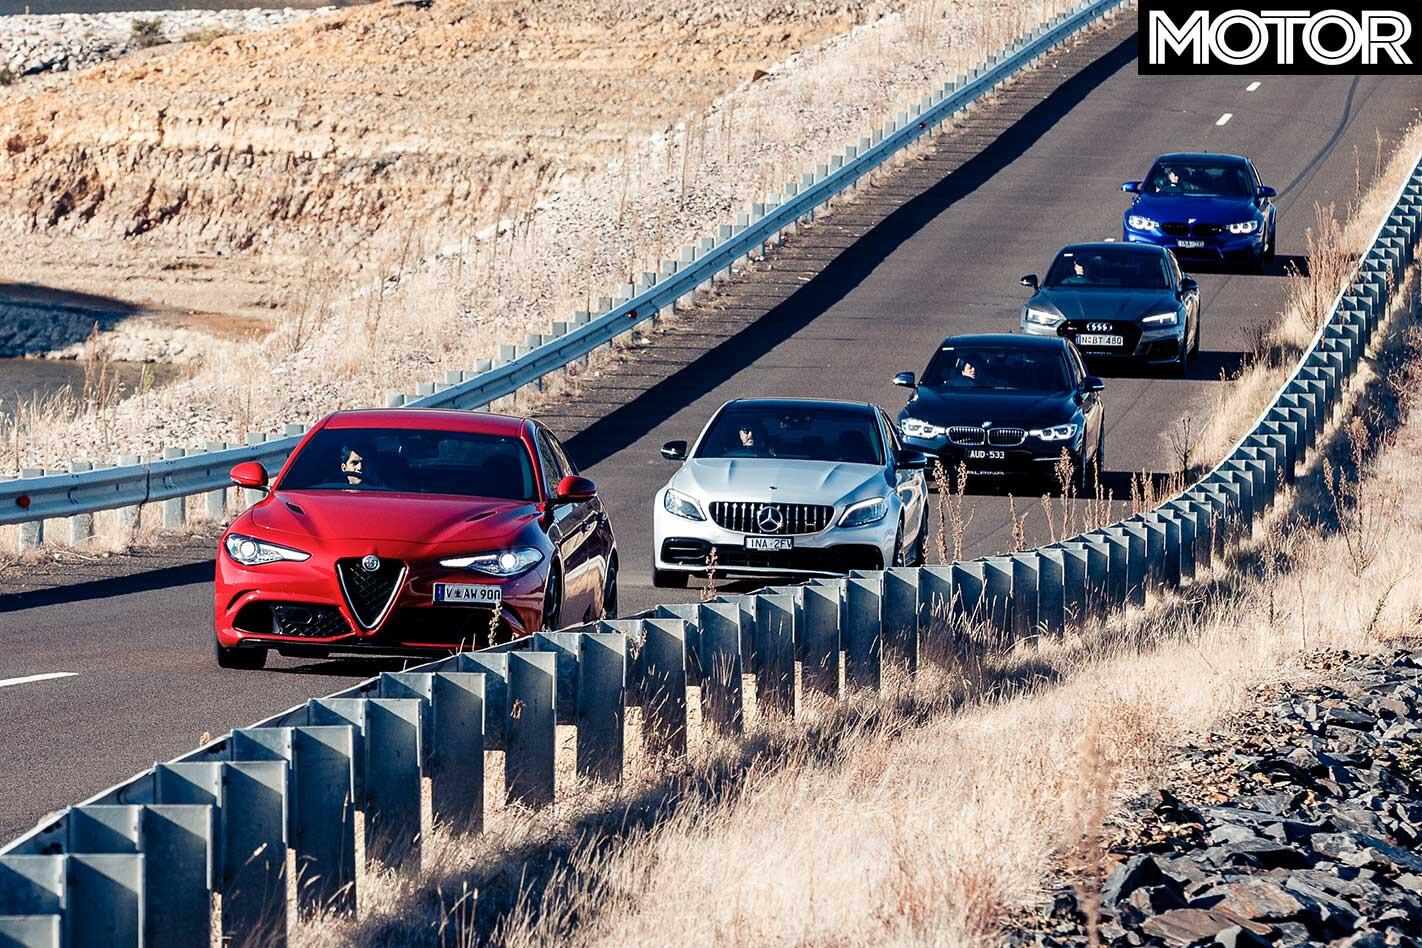 2019 Mercedes AMG C 63 S Vs Audi RS 5 Sportback Vs BMW M 3 Pure Vs Alfa Romeo Giulia Q Vs Alpina B 3 S Acceleration Comparison Jpg